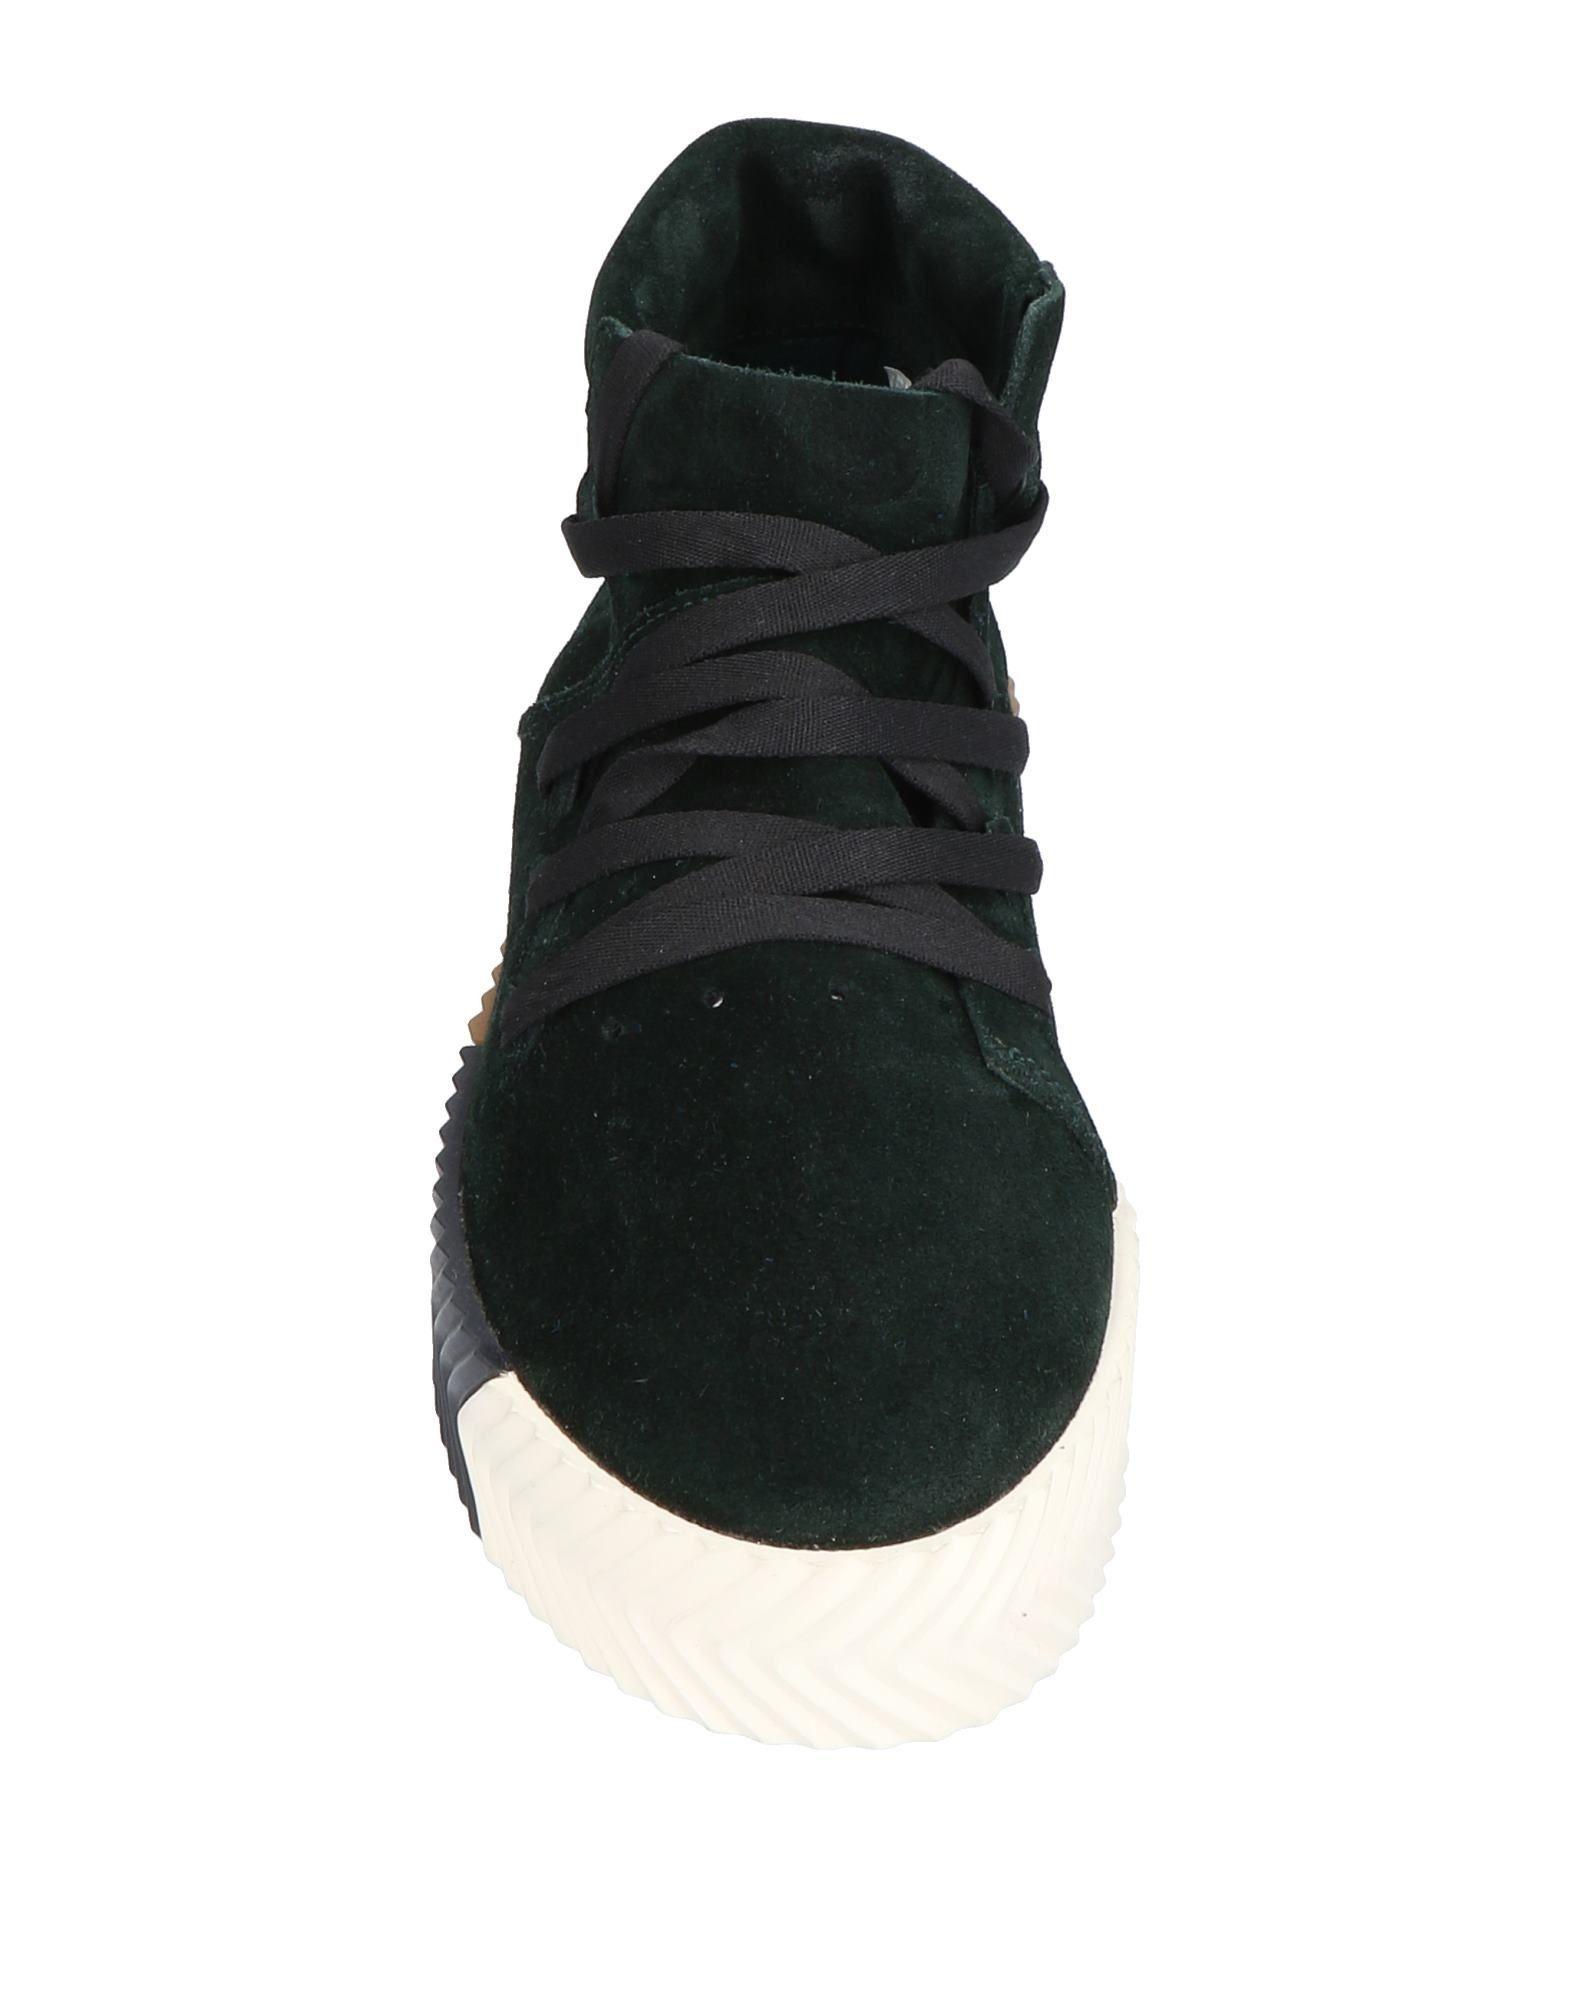 Adidas Dark Green Leather Sneakers